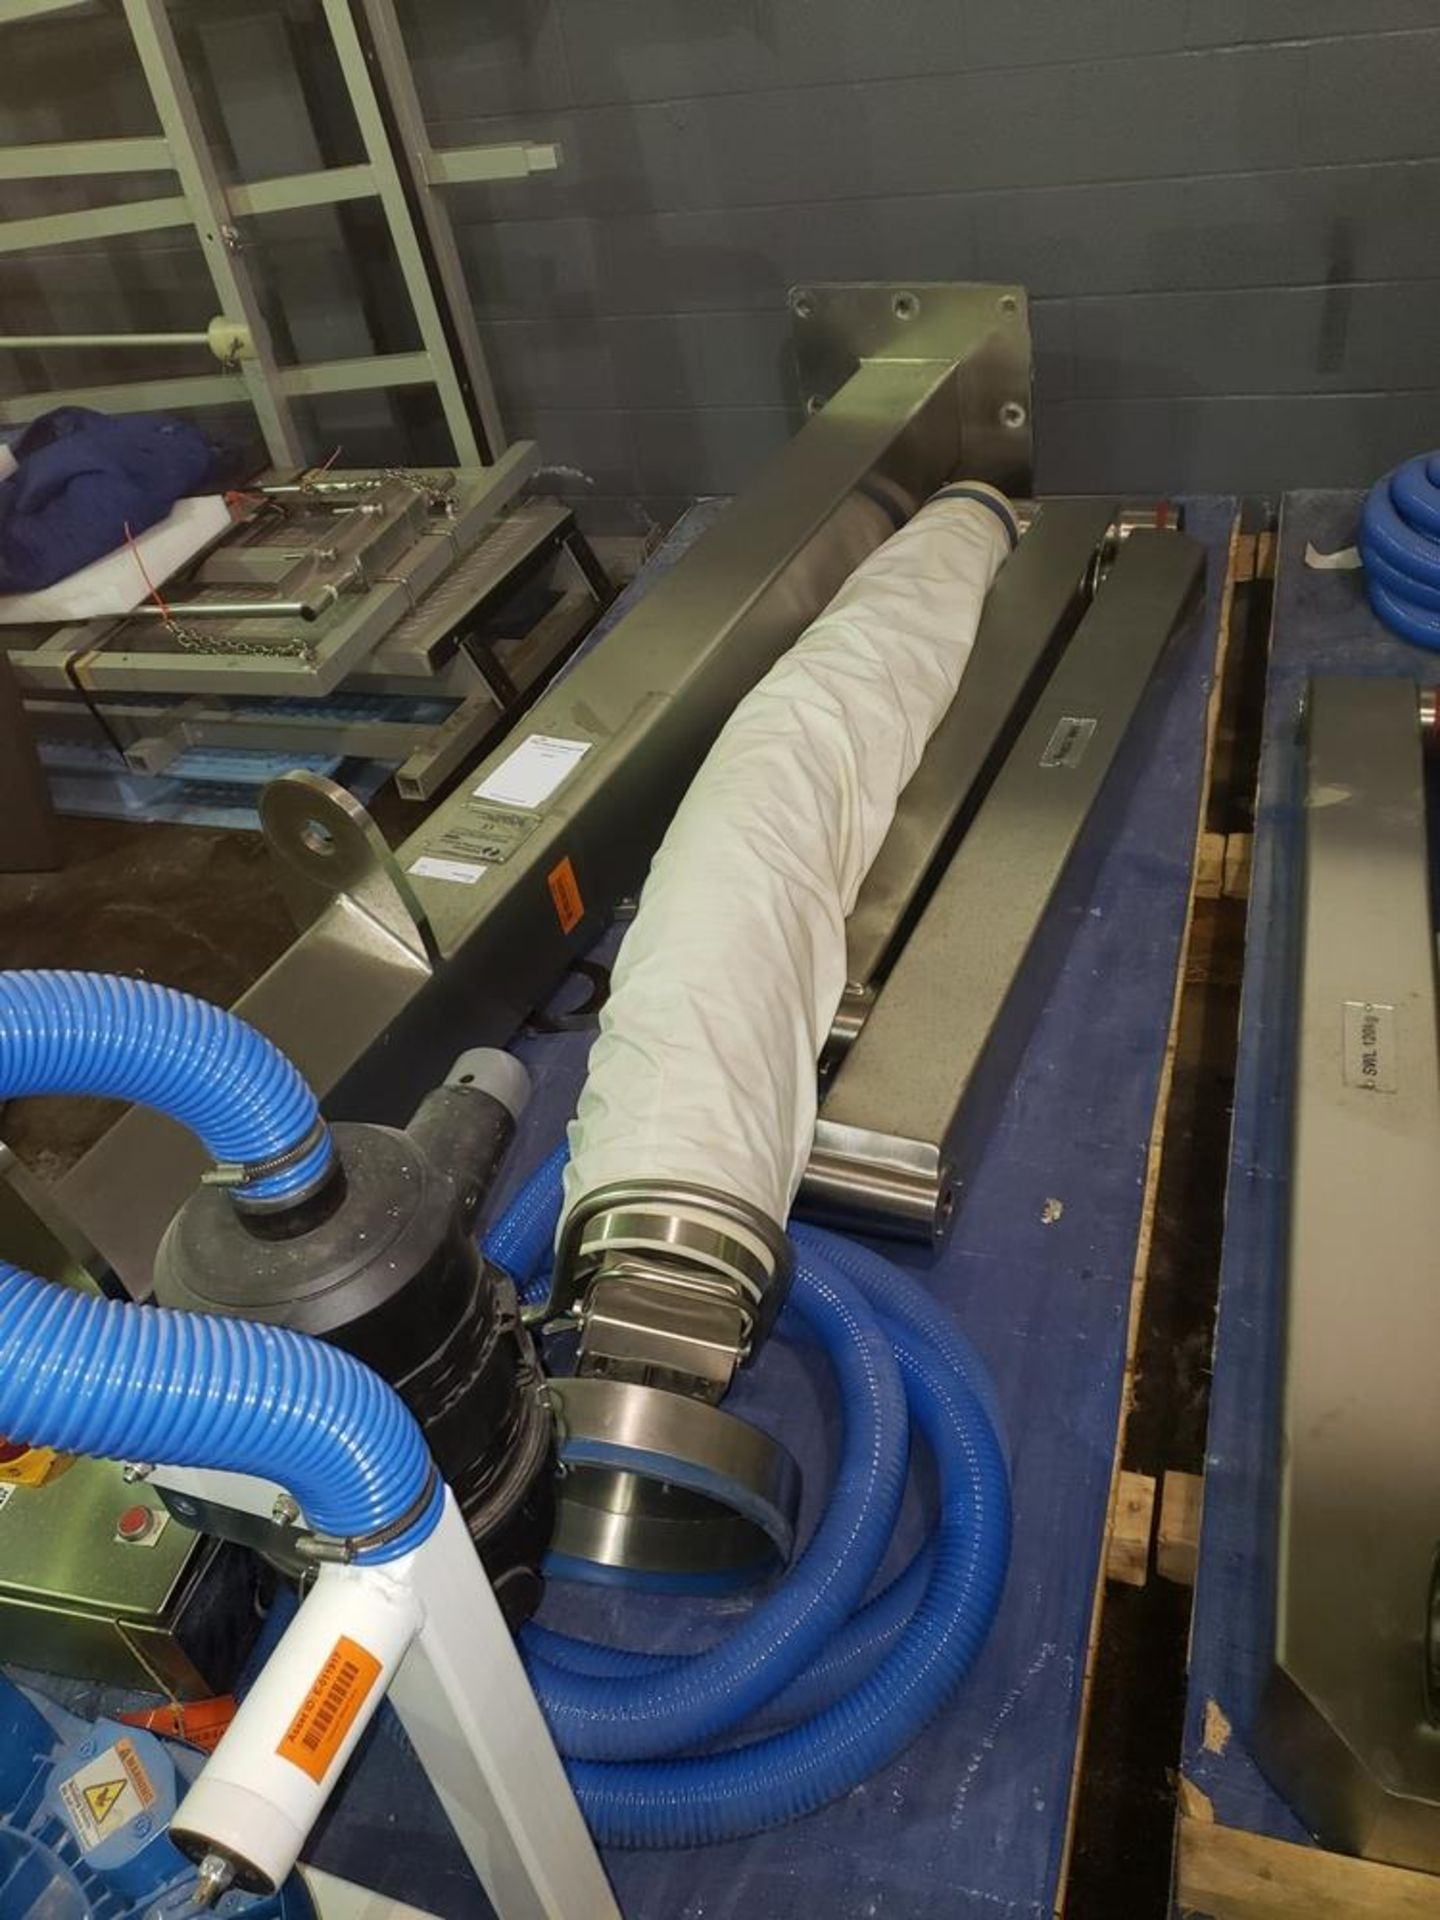 Lot 10 - UnUsed Palmatic gantry vacuum lift assist unit, model PalPharma Vac, stainless steel frame, 120 kg